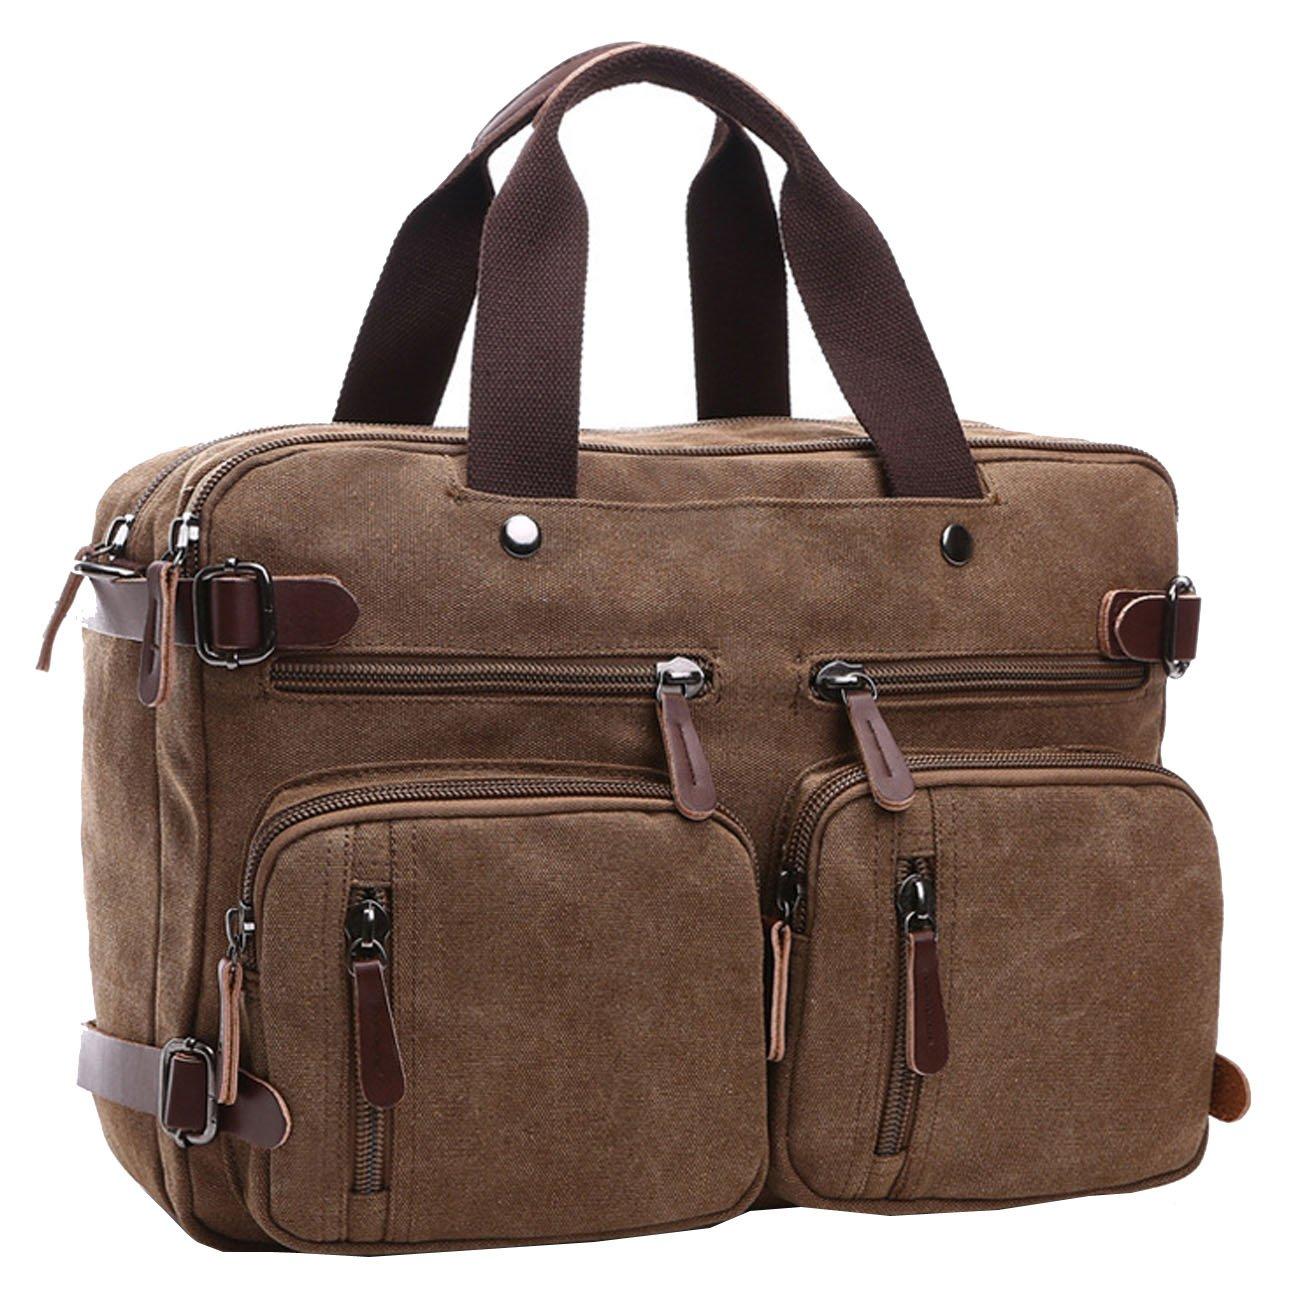 Berchirly Unisex's Canvas Duffel Bags Large Doctor Office Bag School Backpacks